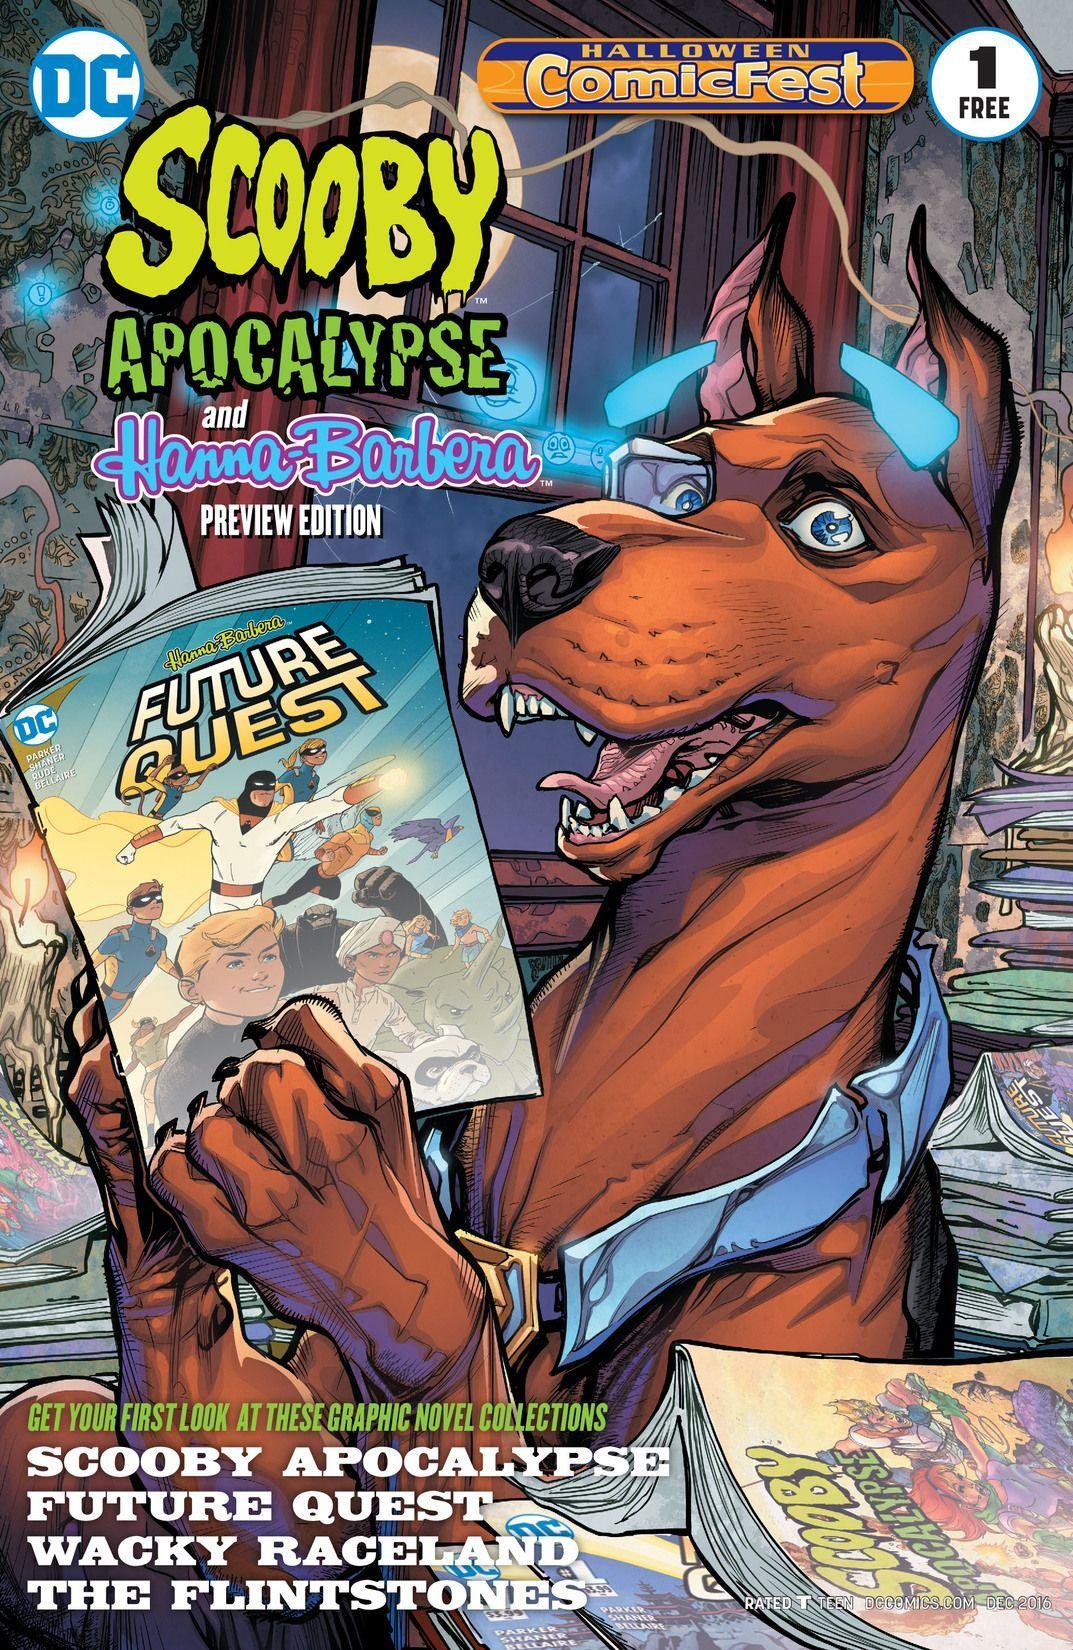 Scooby Apocalypse/HannaBarbera Halloween ComicsFest